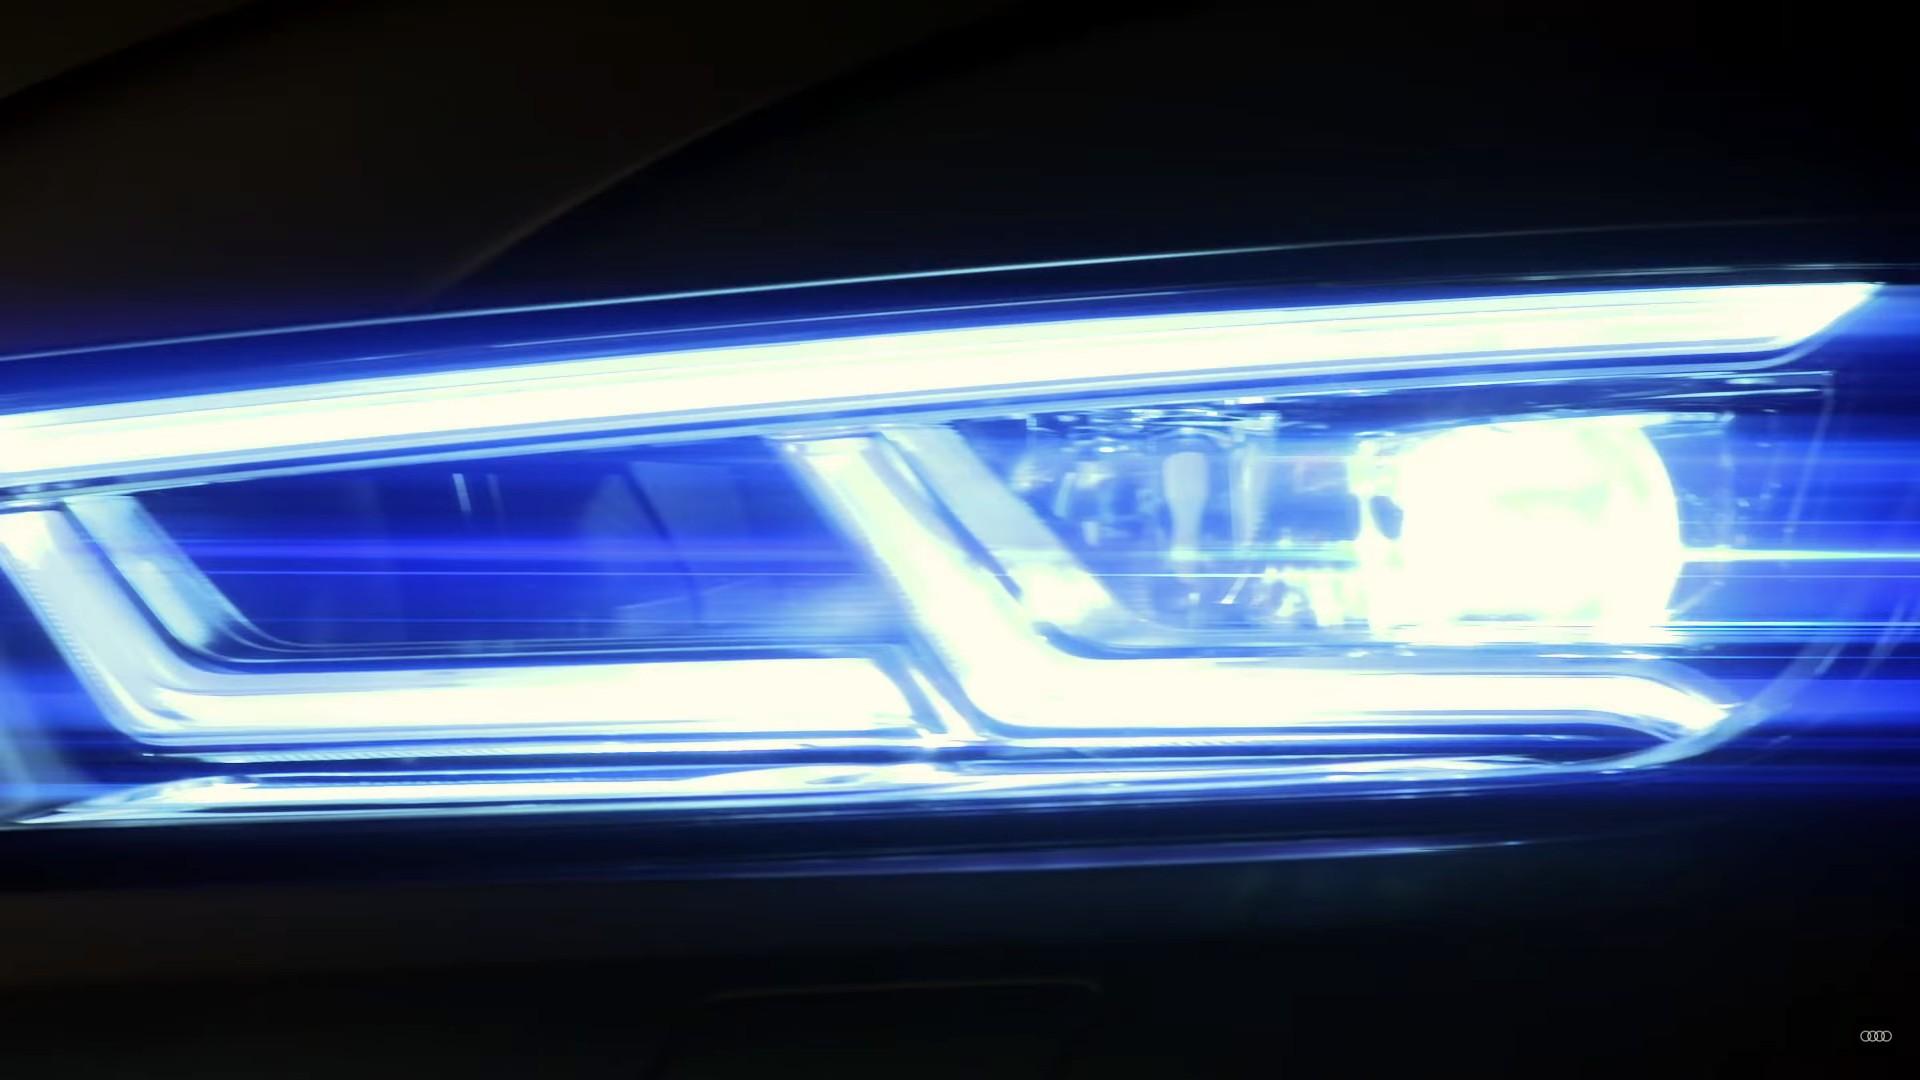 2017 Audi Q5 Shows Matrix LED Headlights and Huge Trunk - autoevolution